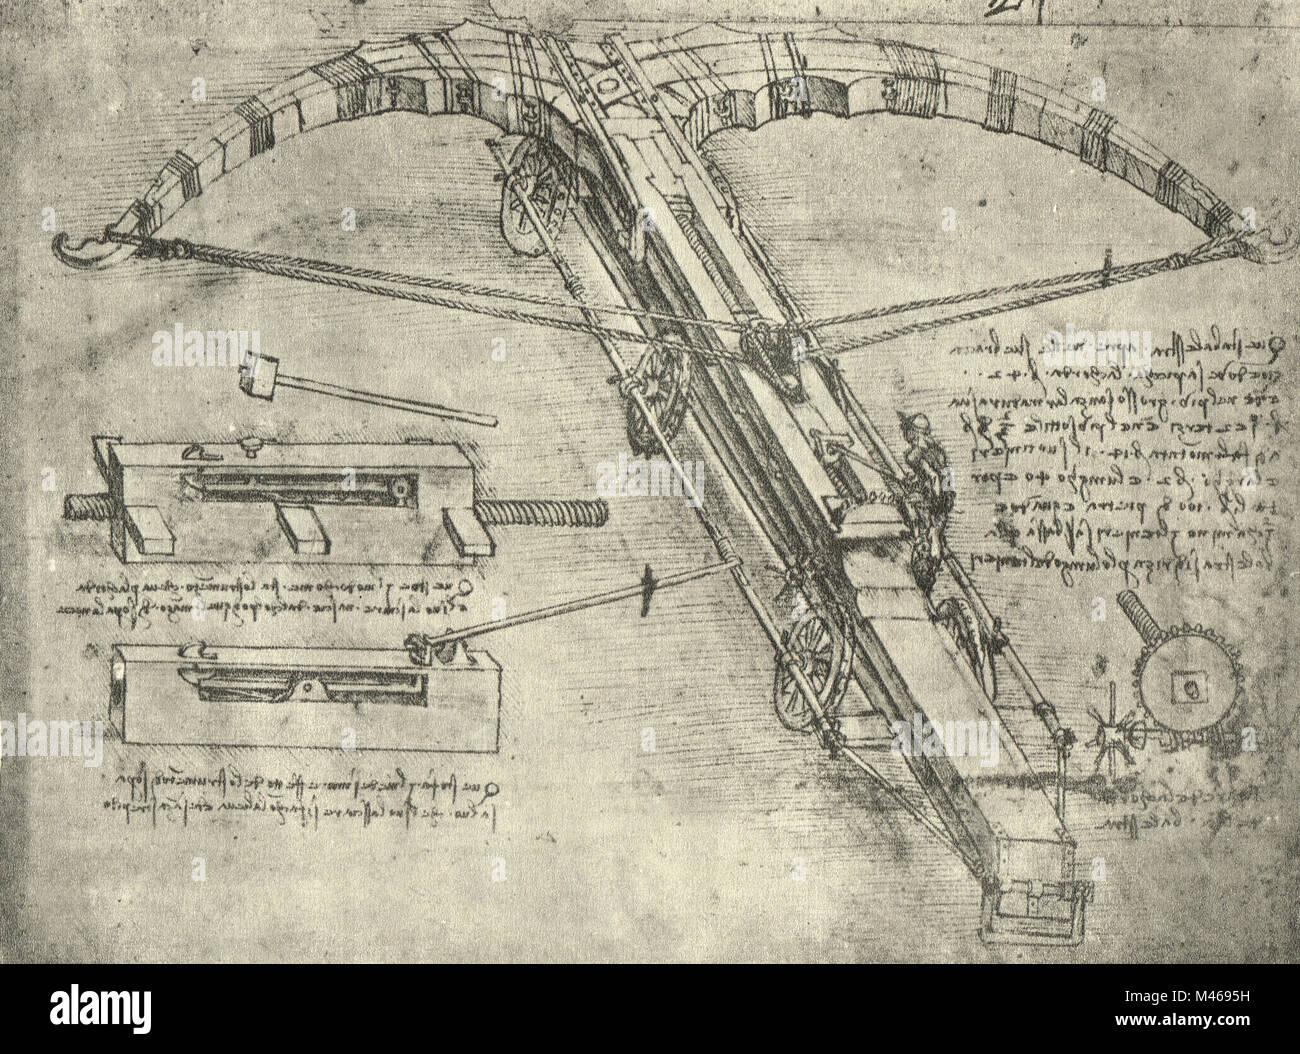 Enormous crossbow on wheel, drawn by Leonardo Da Vinci, circa 1485-88 - Stock Image